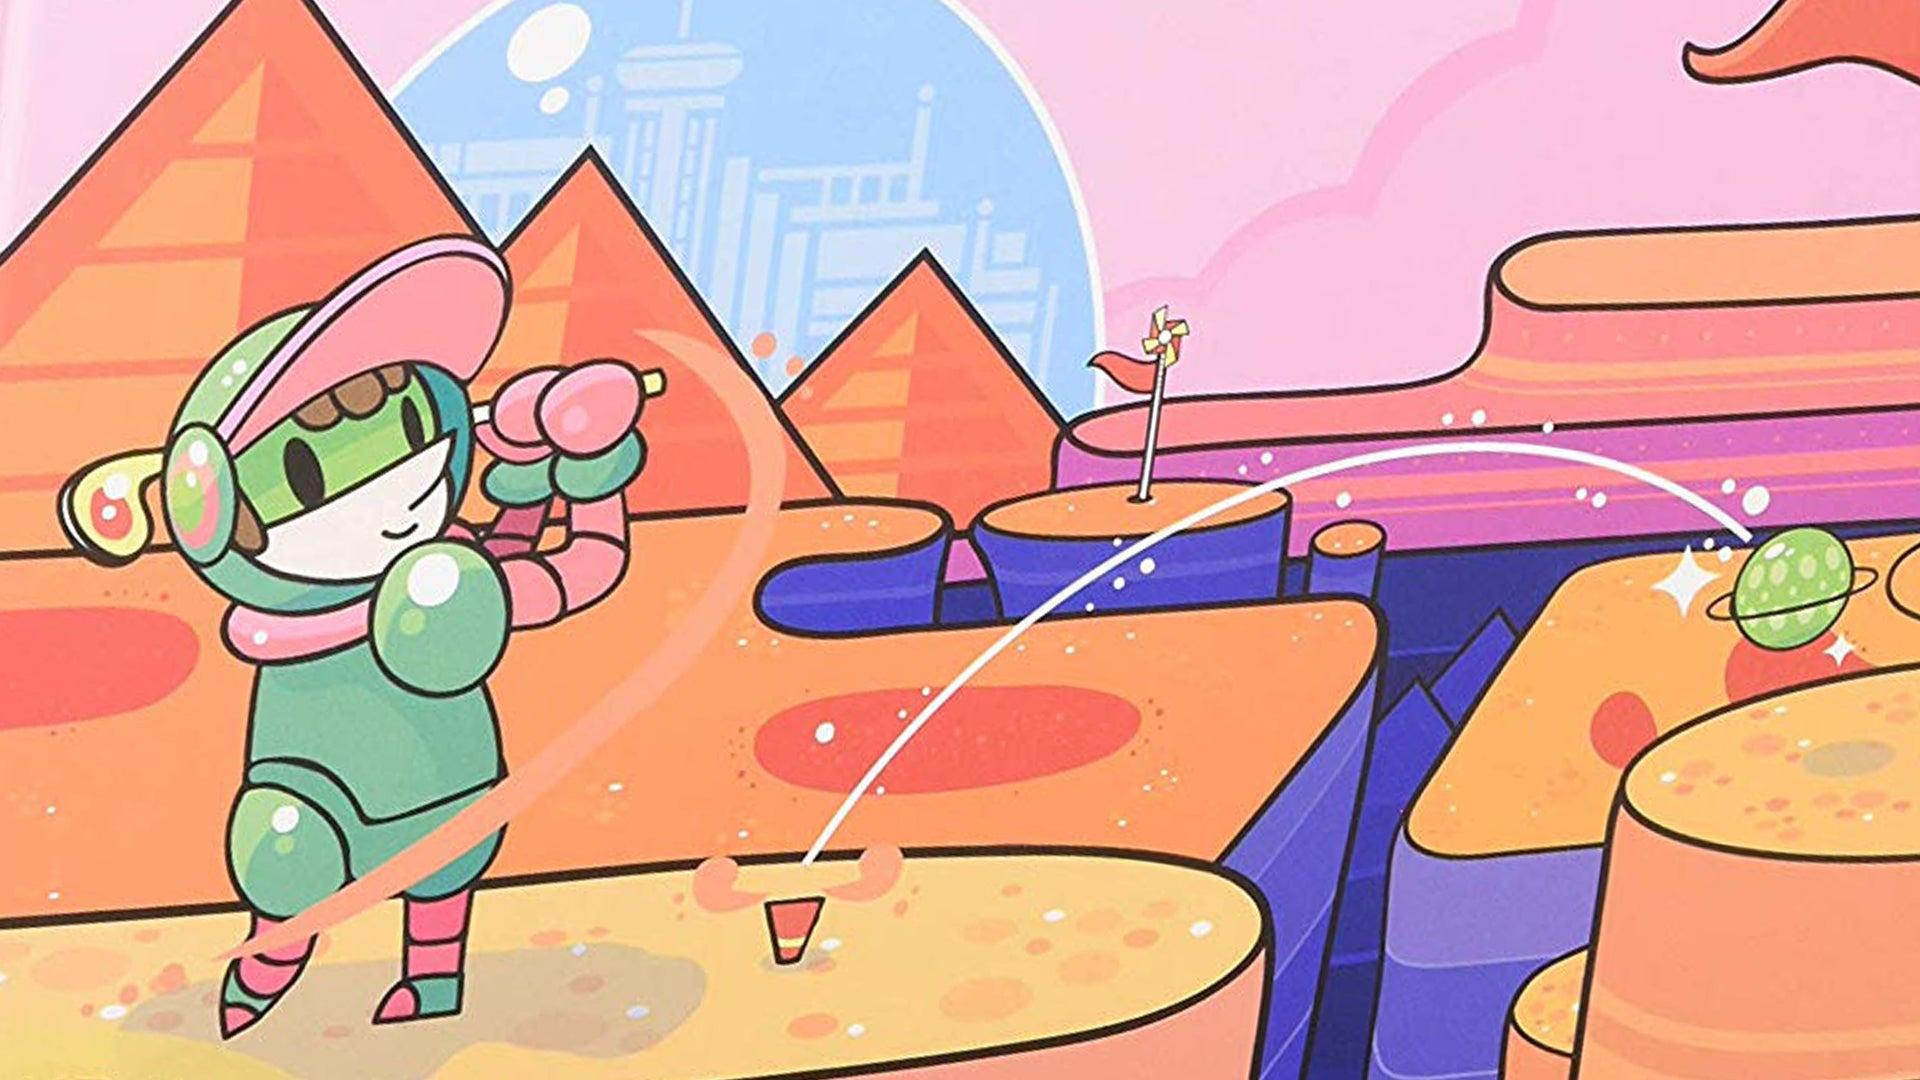 mars-open-tabletop-golf-board-game-box.jpg